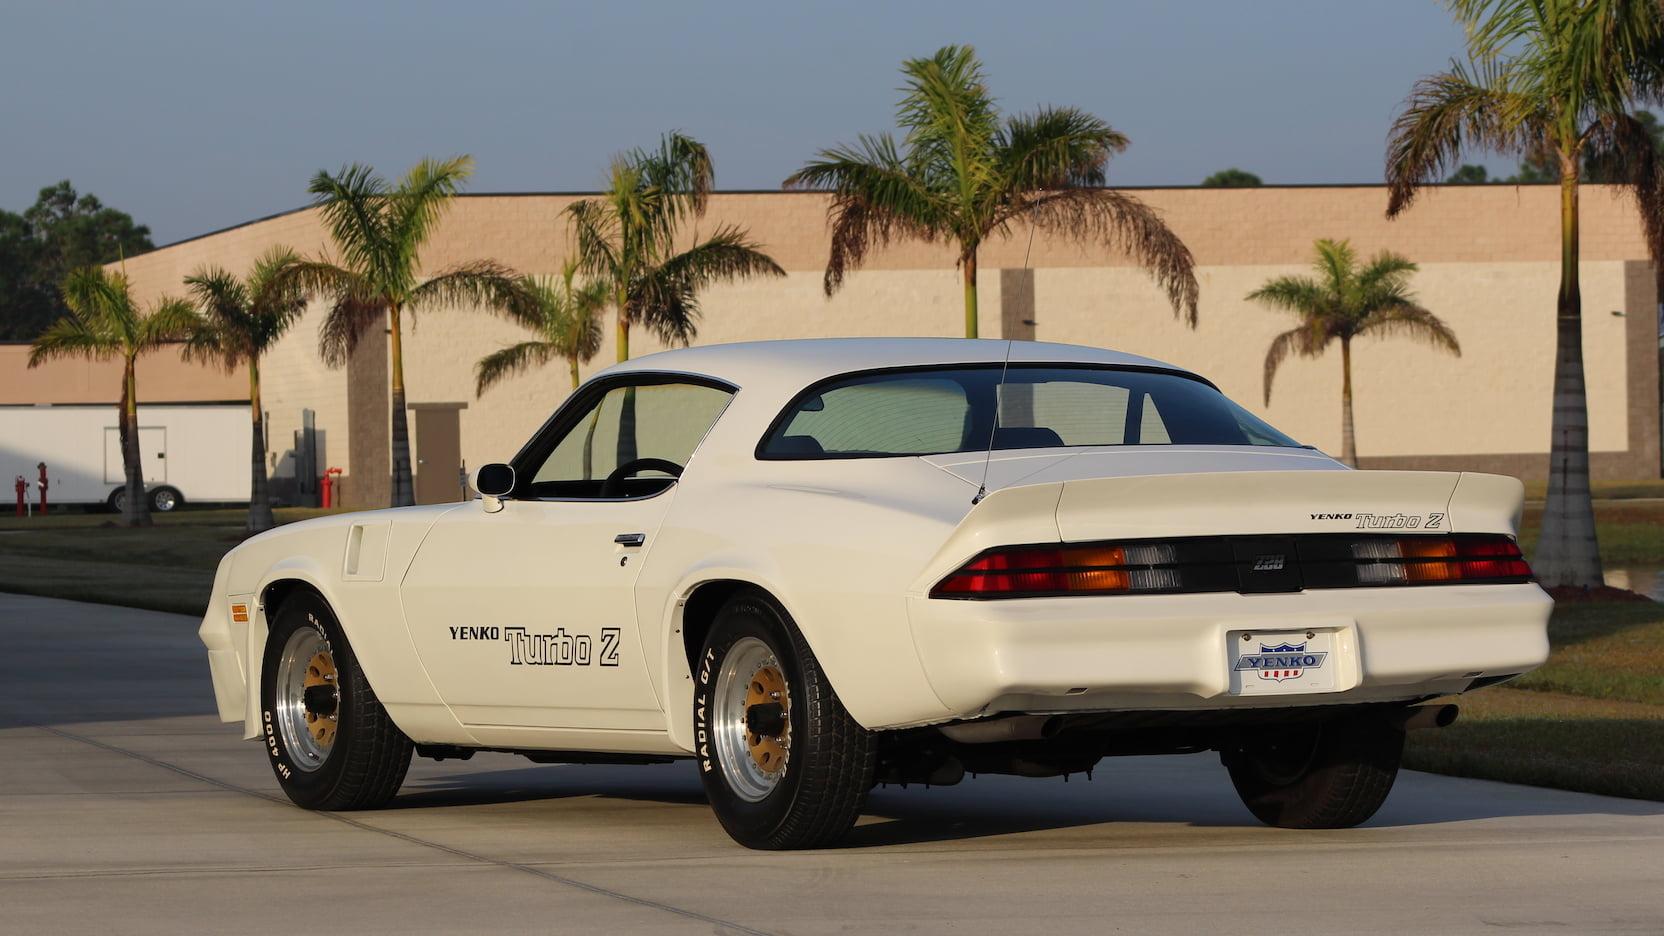 1981 Chevrolet Yenko Turbo Z rear 3/4